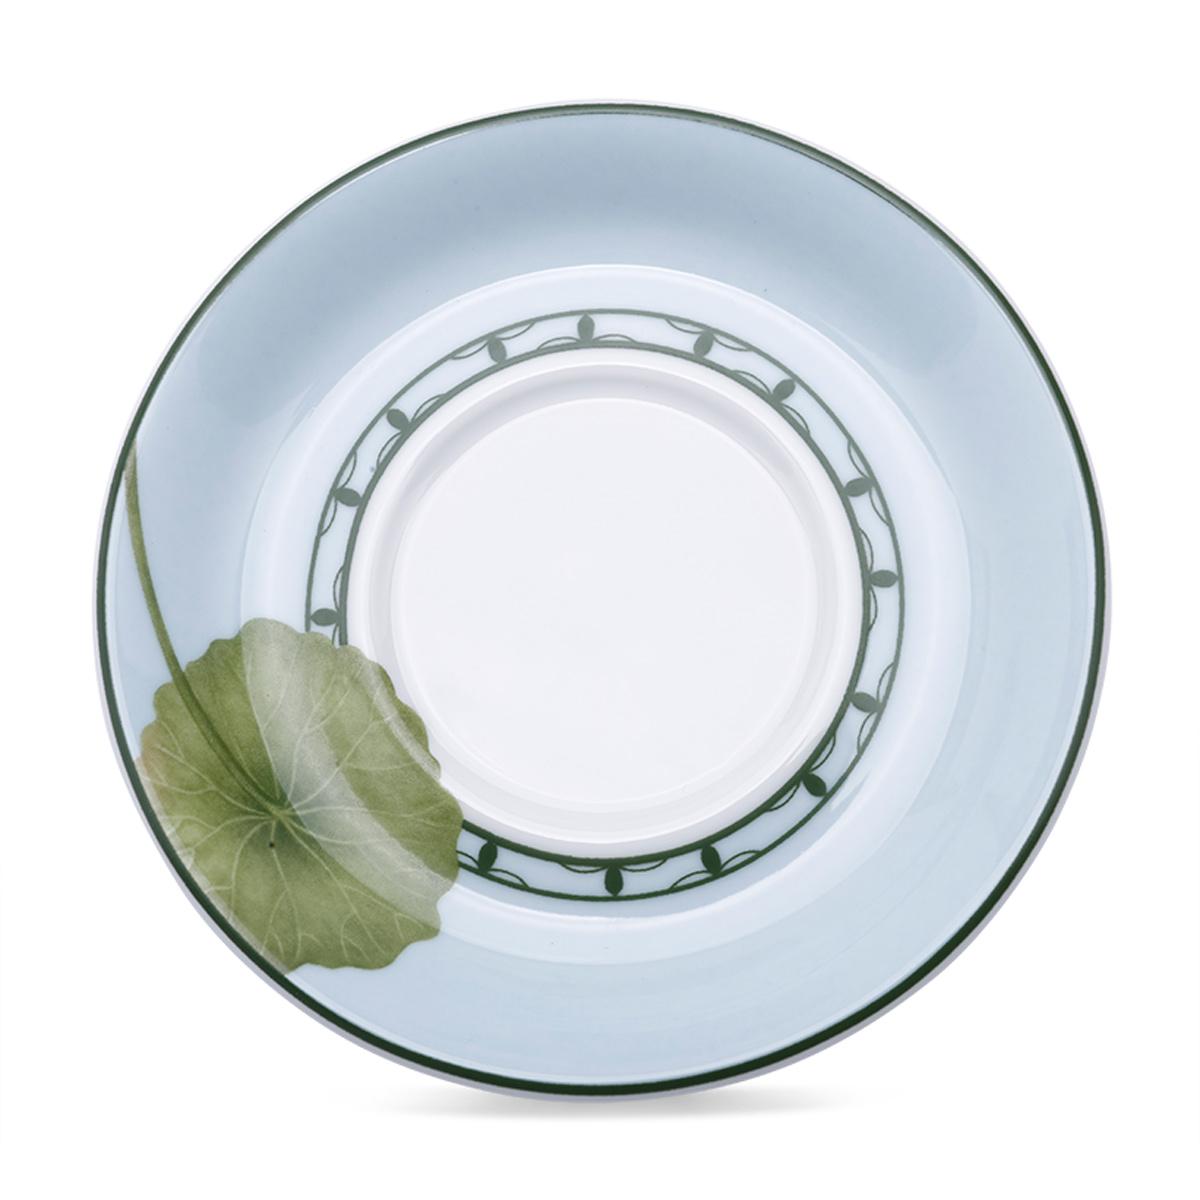 Bộ trà 0.7 L – JASMINE – Tích tuyết thảo - MNV-JM01071131403